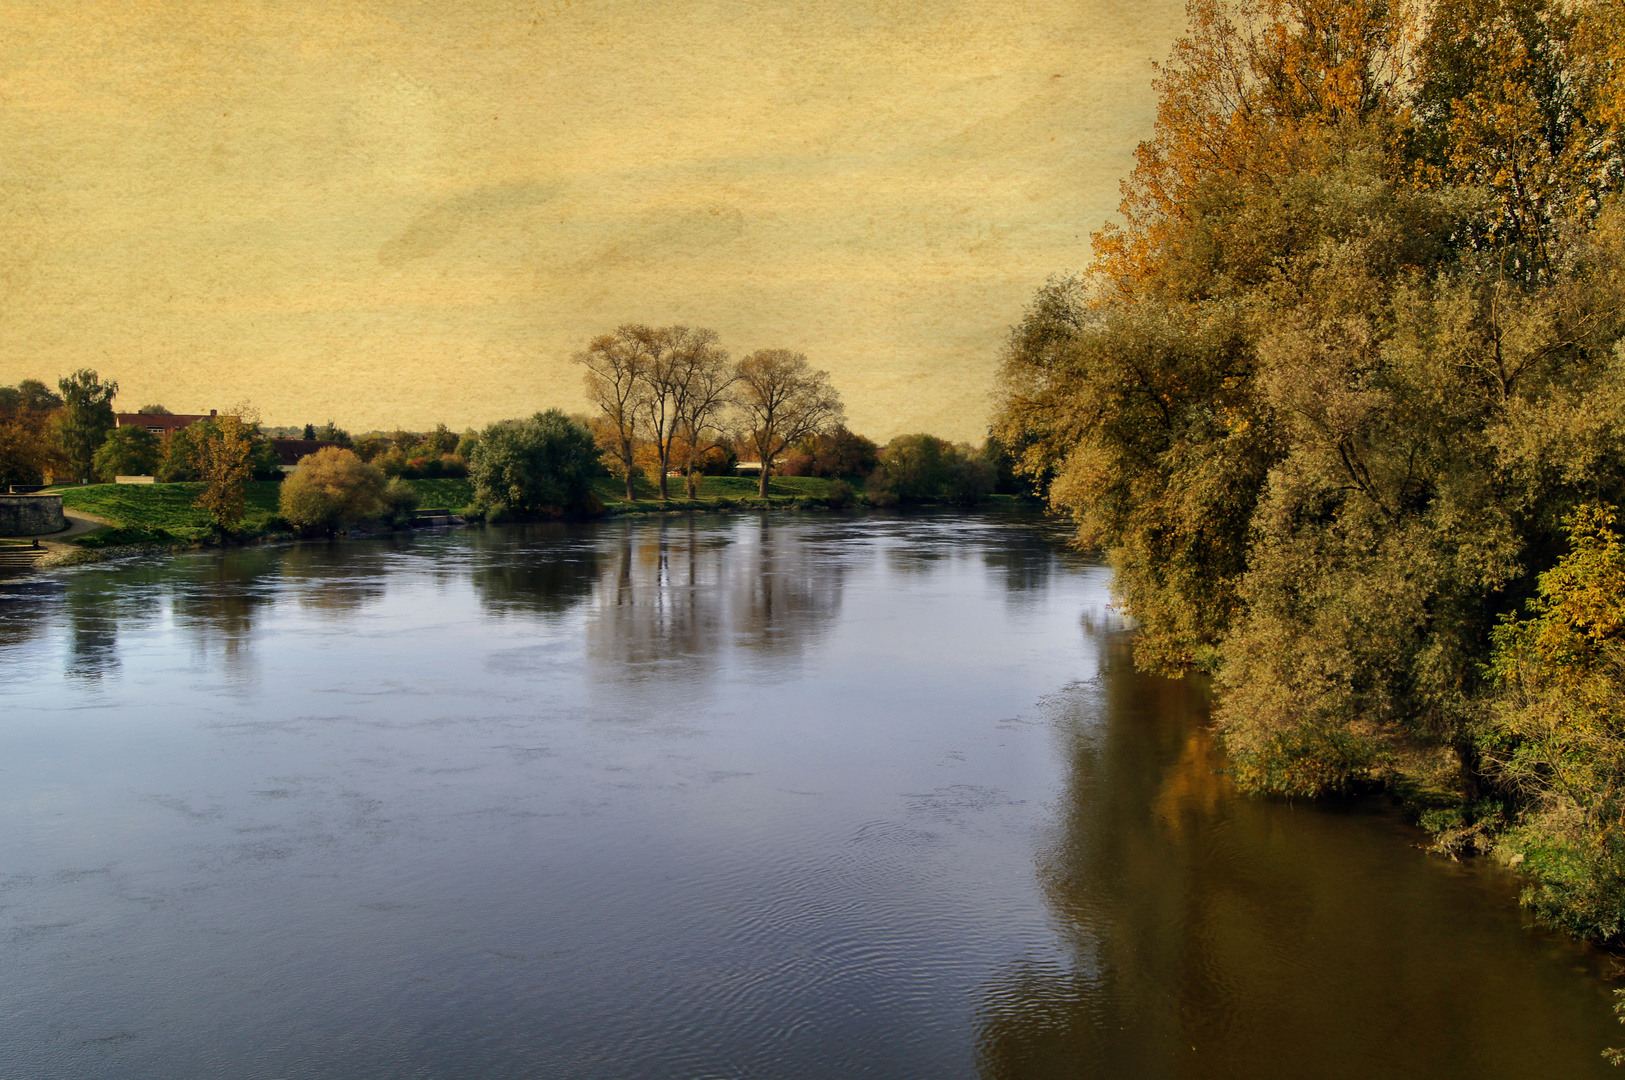 Donau bei Straubing Retro-Art